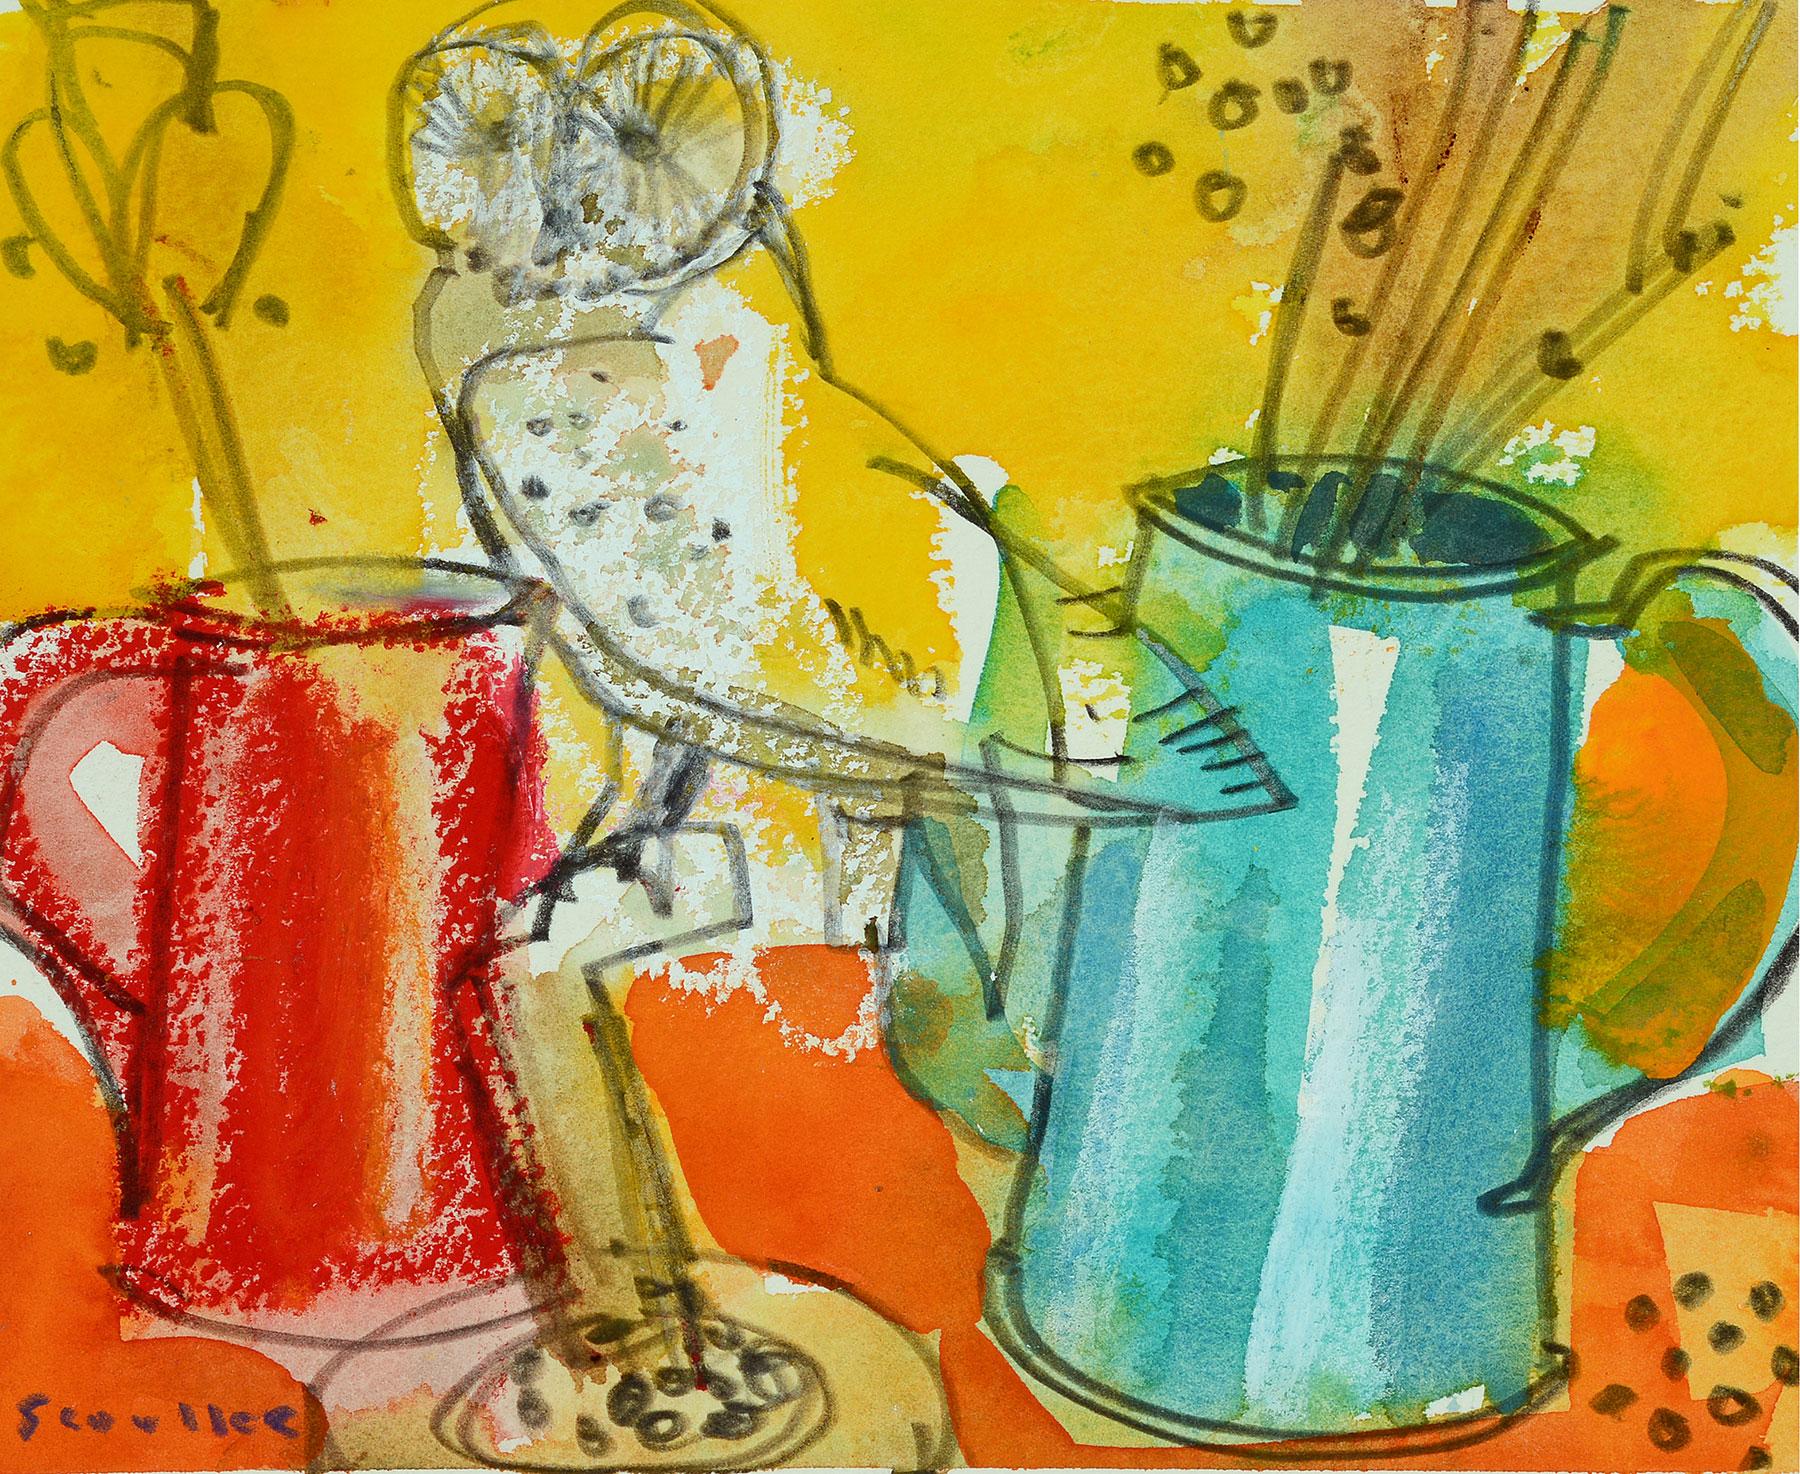 Glen Scoulier Owl and Two Jugs